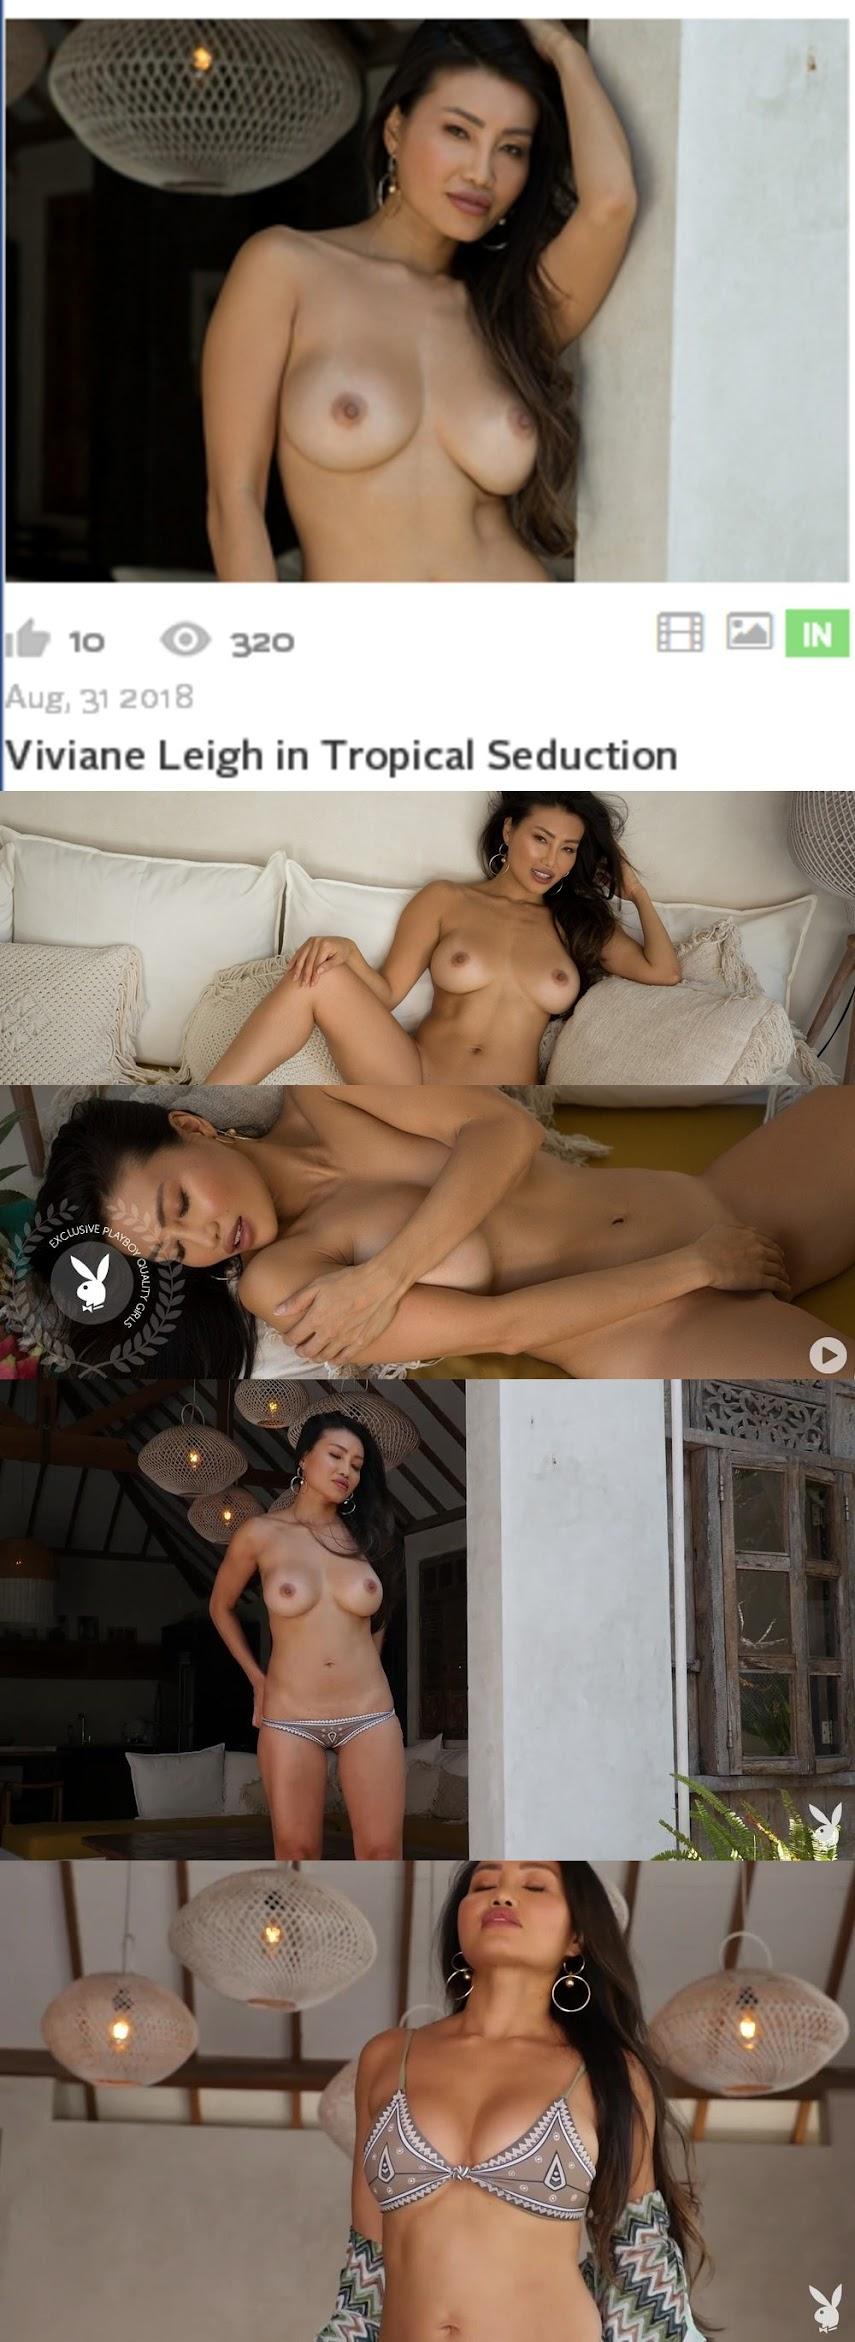 Playboy PlayboyPlus2018-08-31 Viviane Leigh in Tropical Seduction